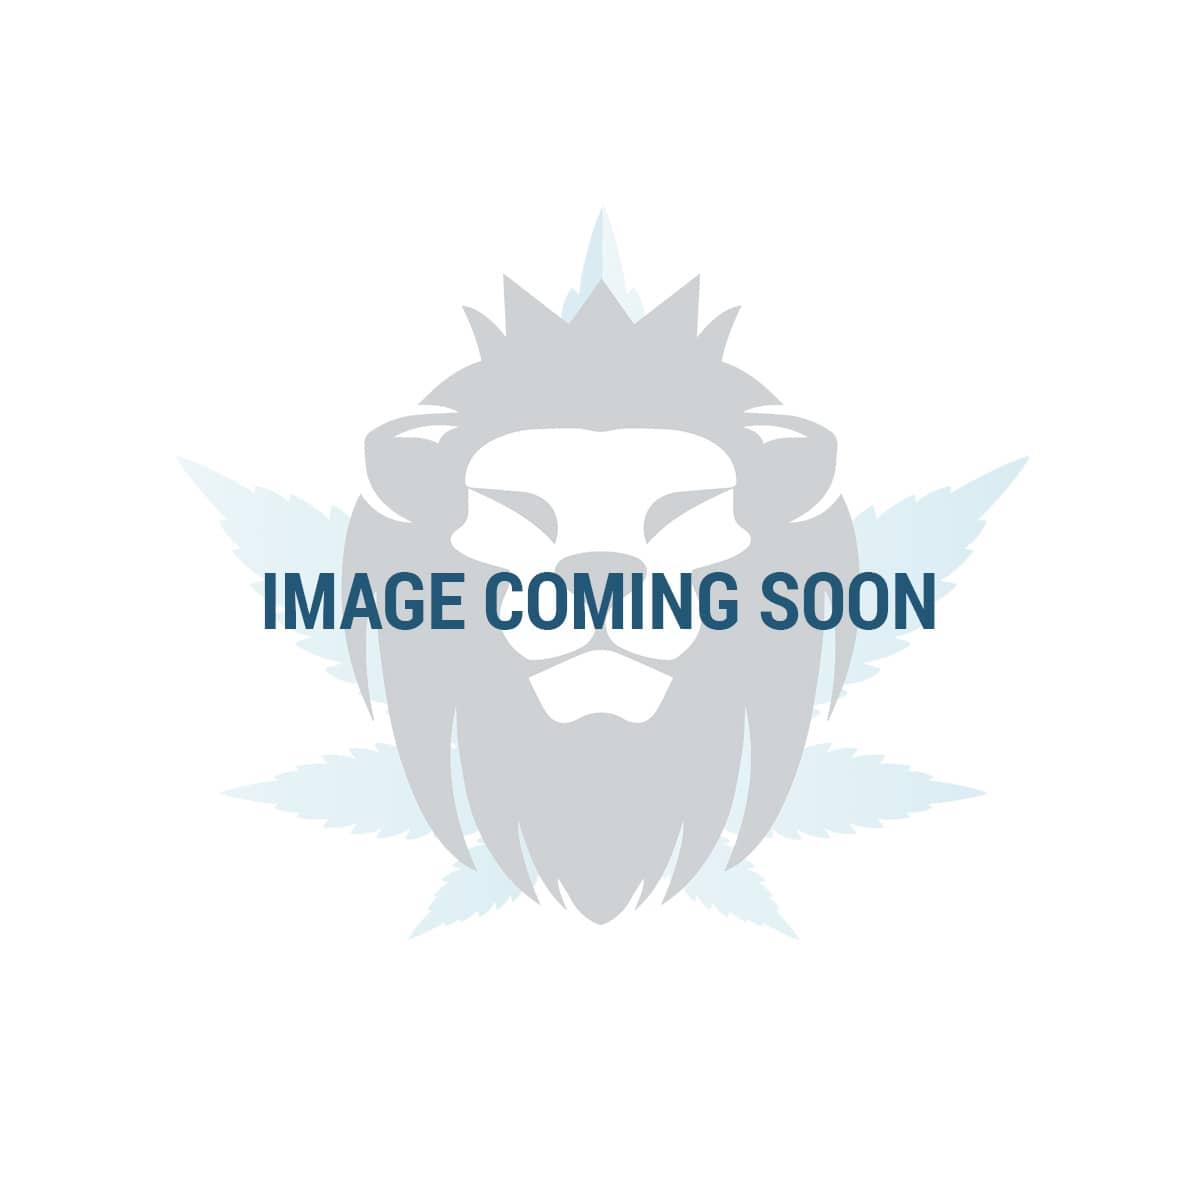 MR NICE Organic CBD Oil 10ml